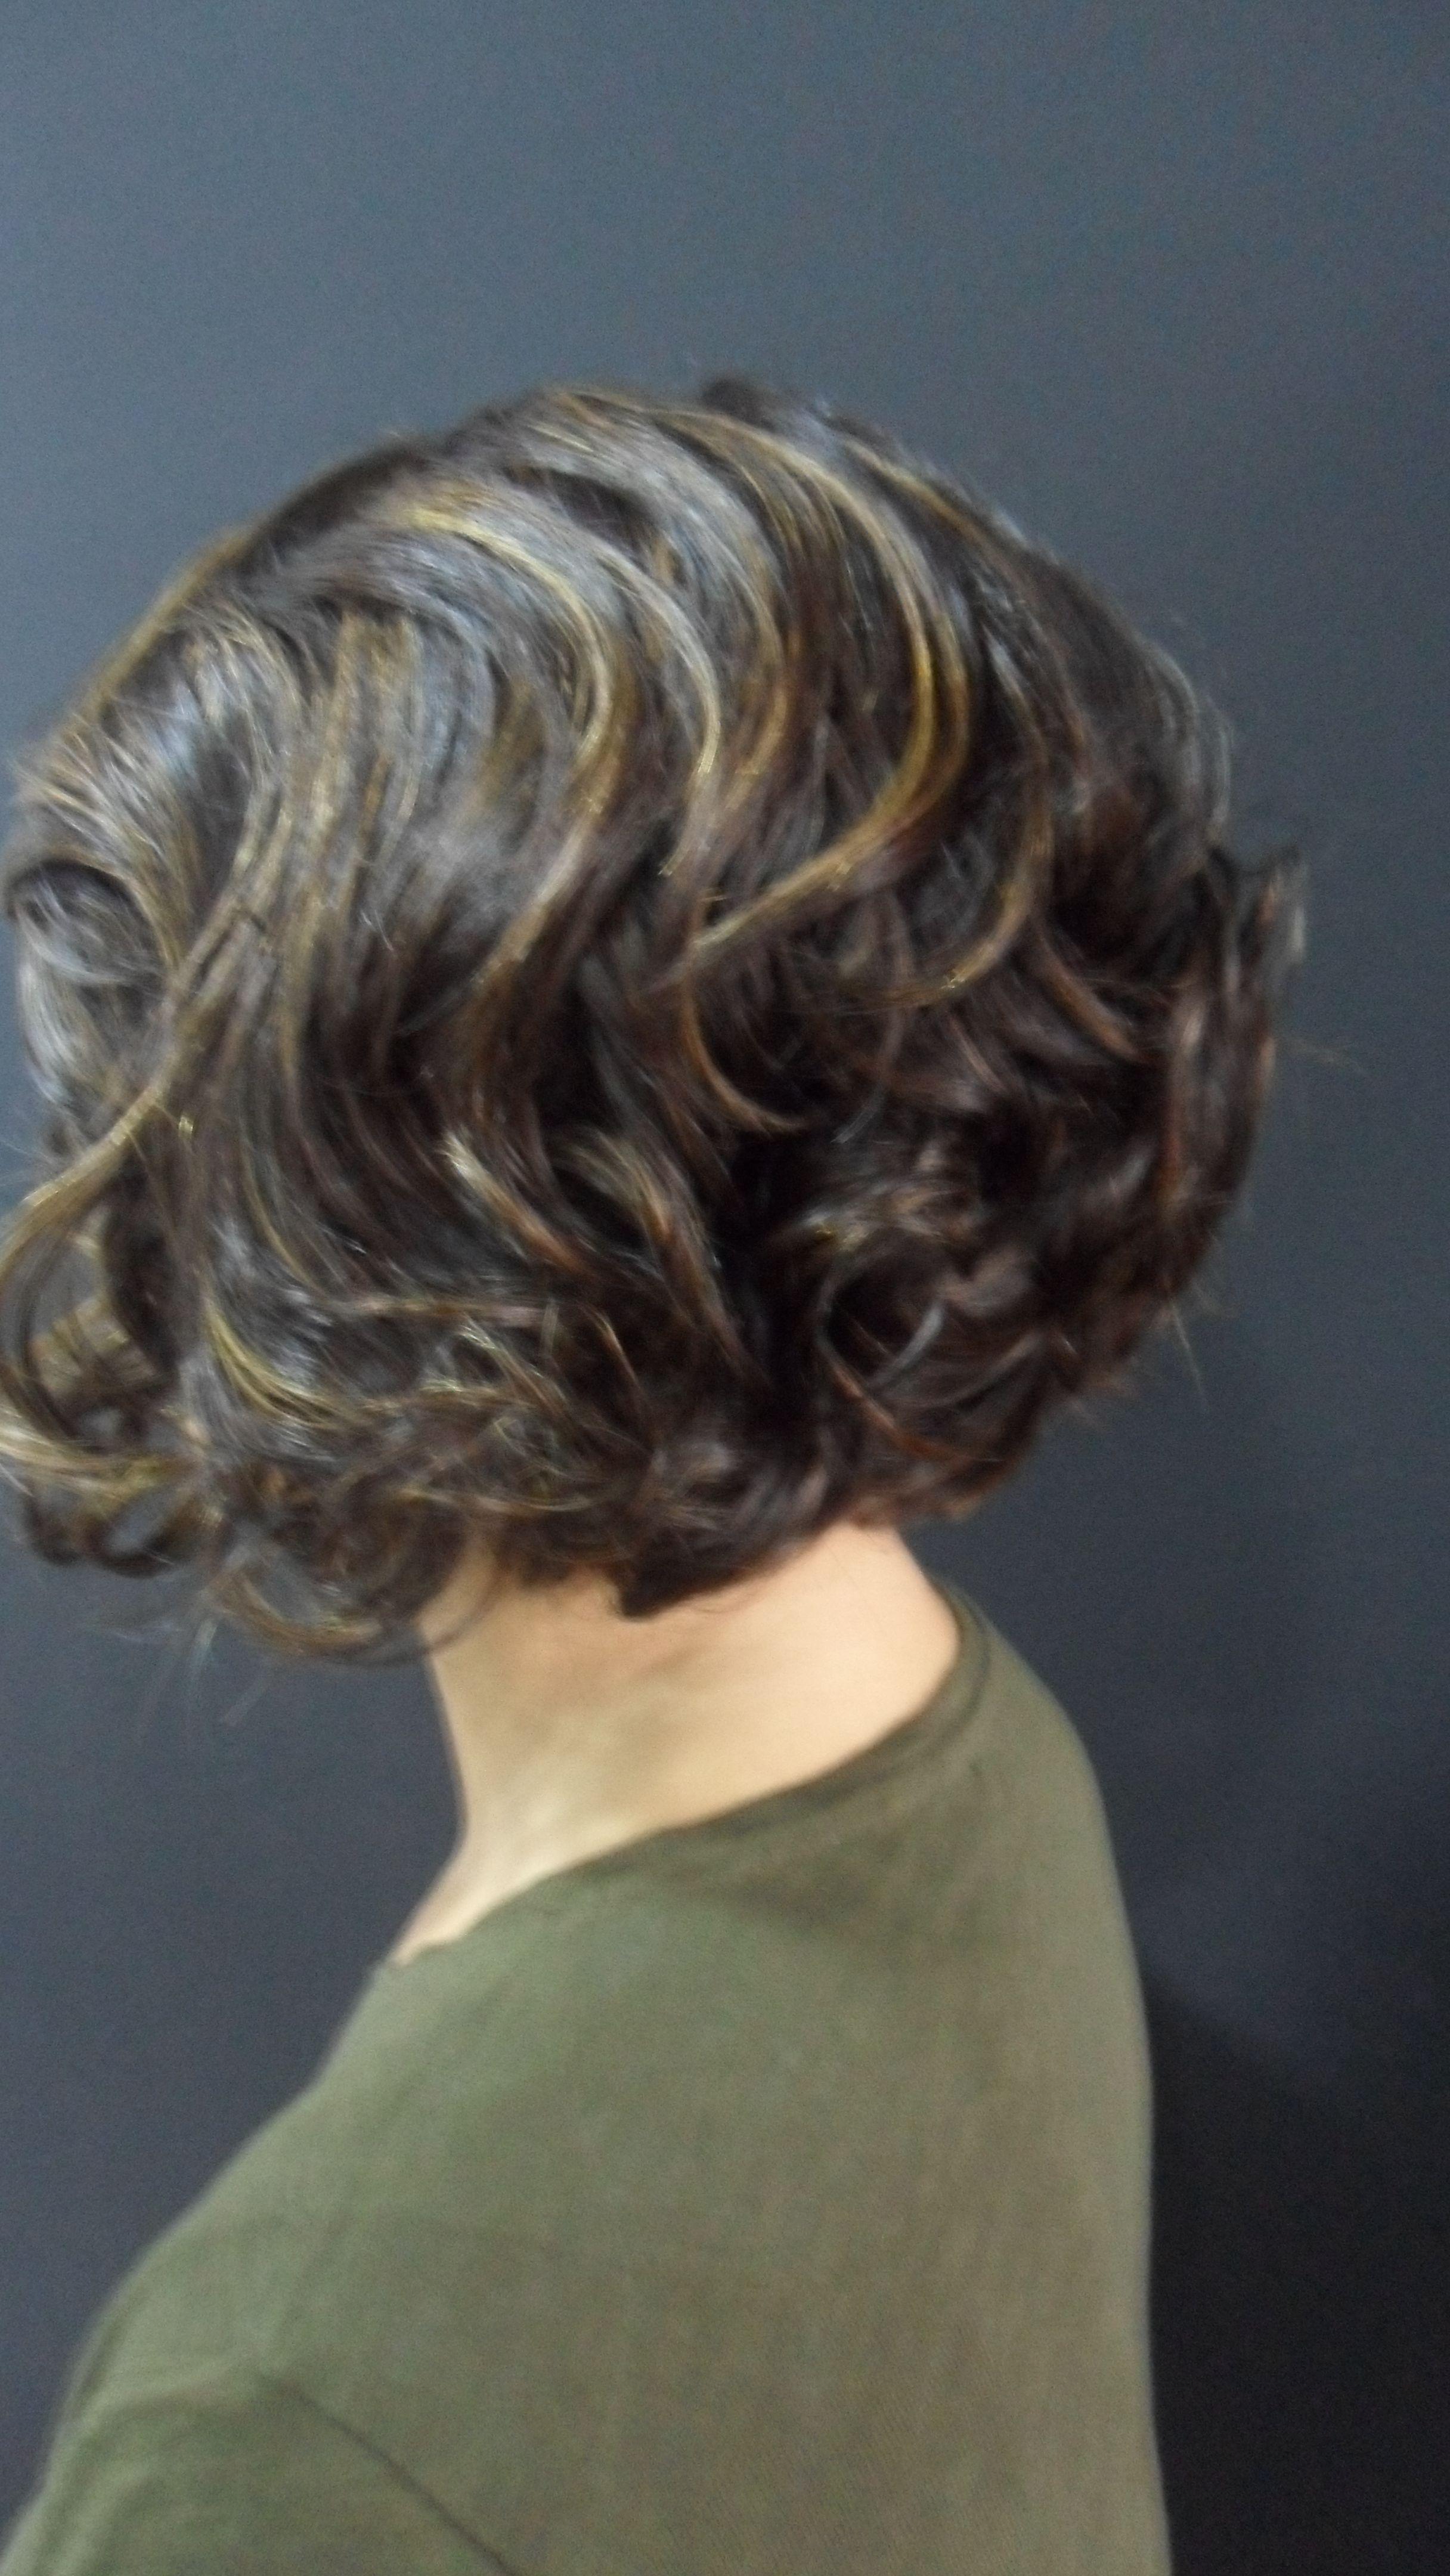 Peluqueria En Coruna Peinados Cabello Corto Peluqueria Cabello